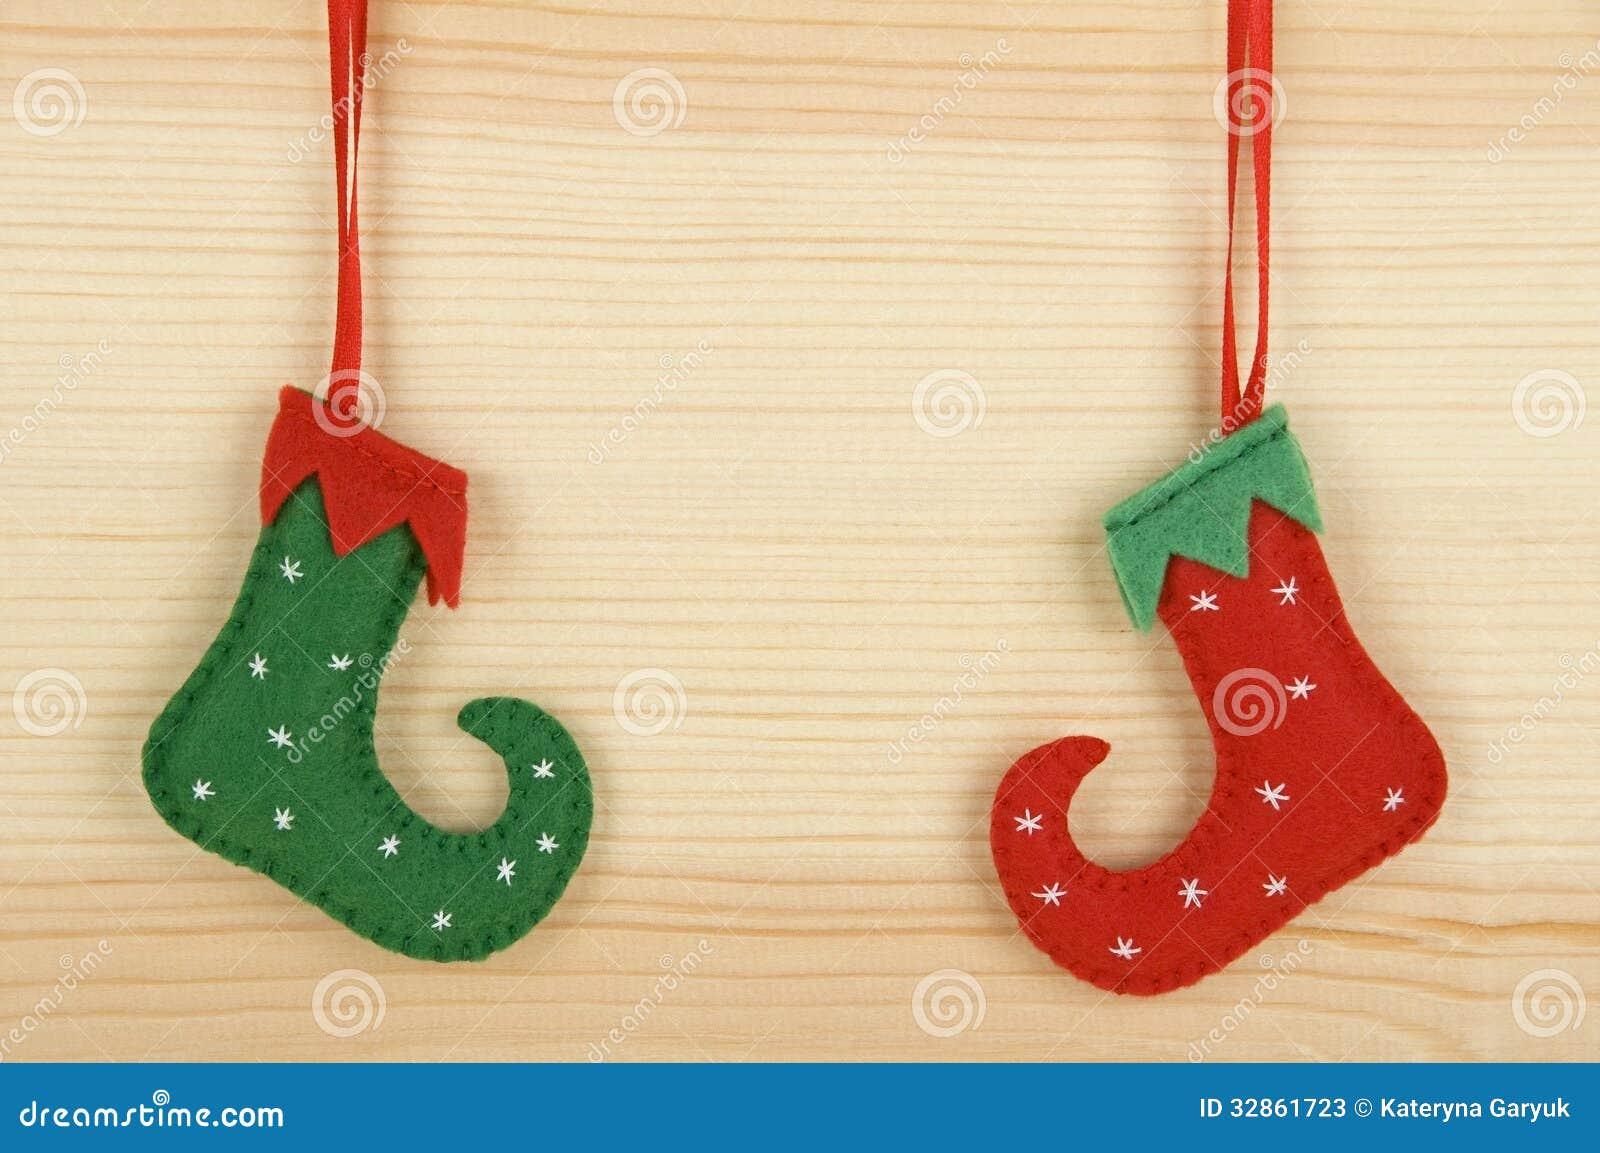 Handmade Christmas Decorations Stock Image Image Of Objects Shoe